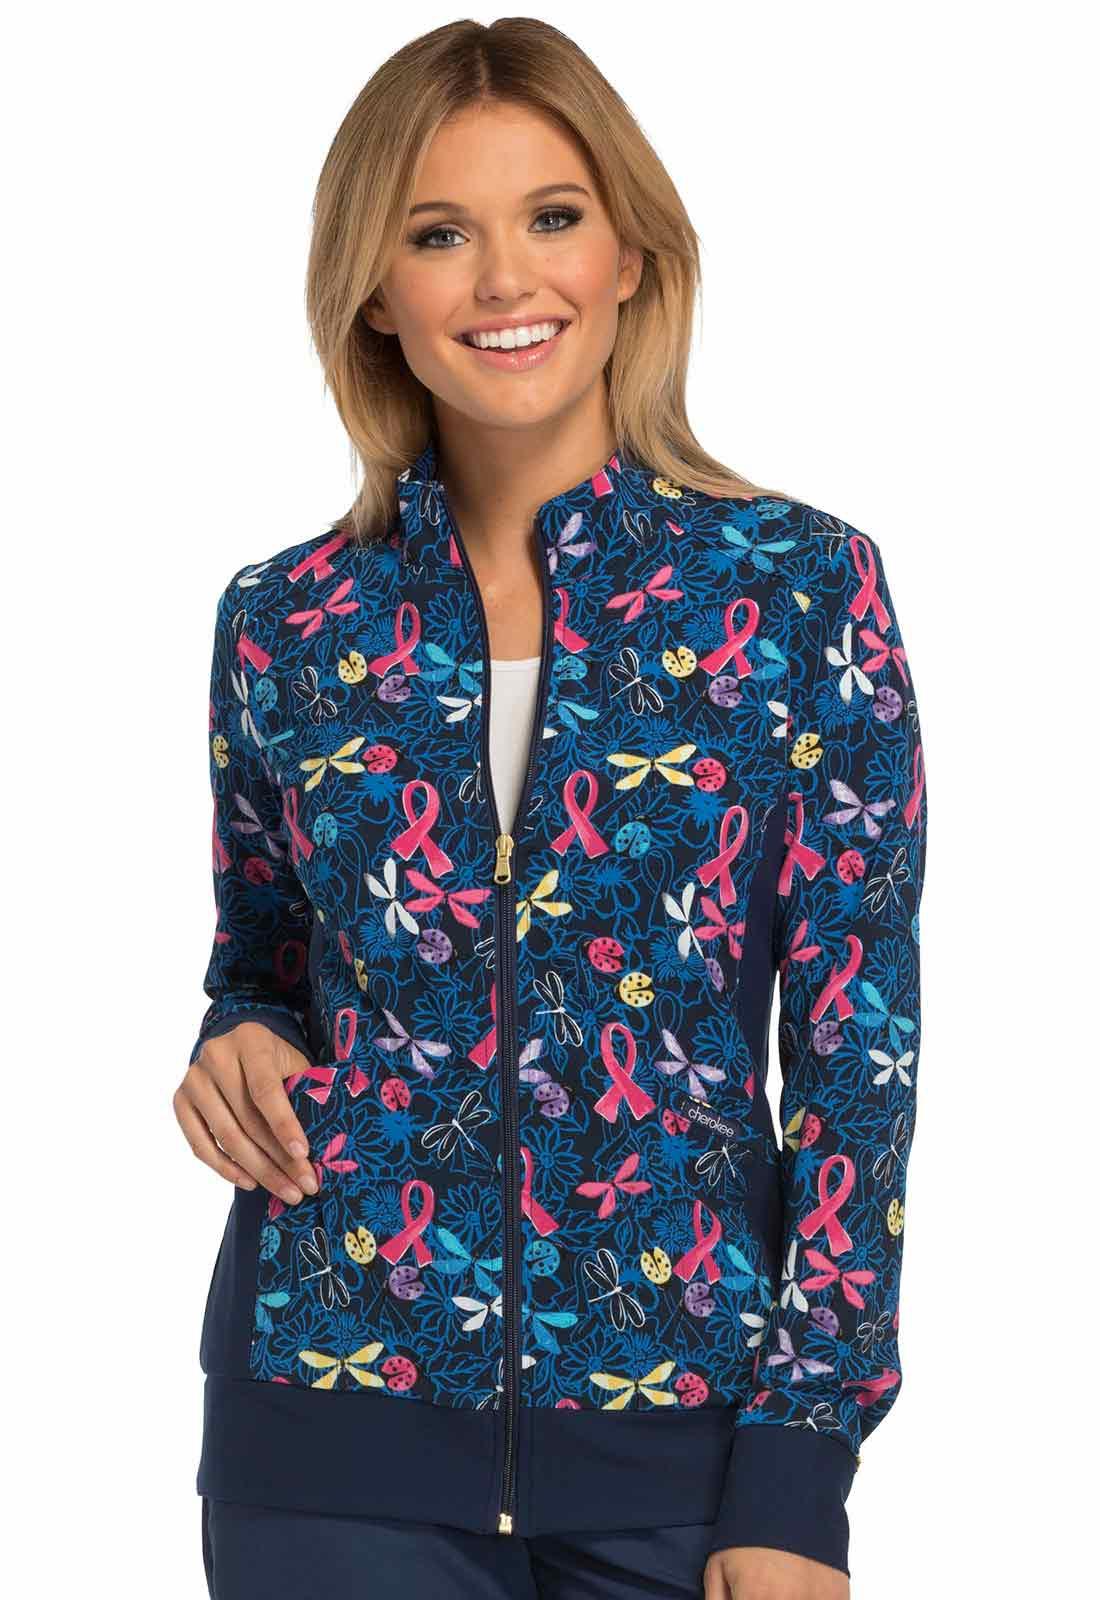 Zip Front Knit Panel Print Warm-Up Jacket